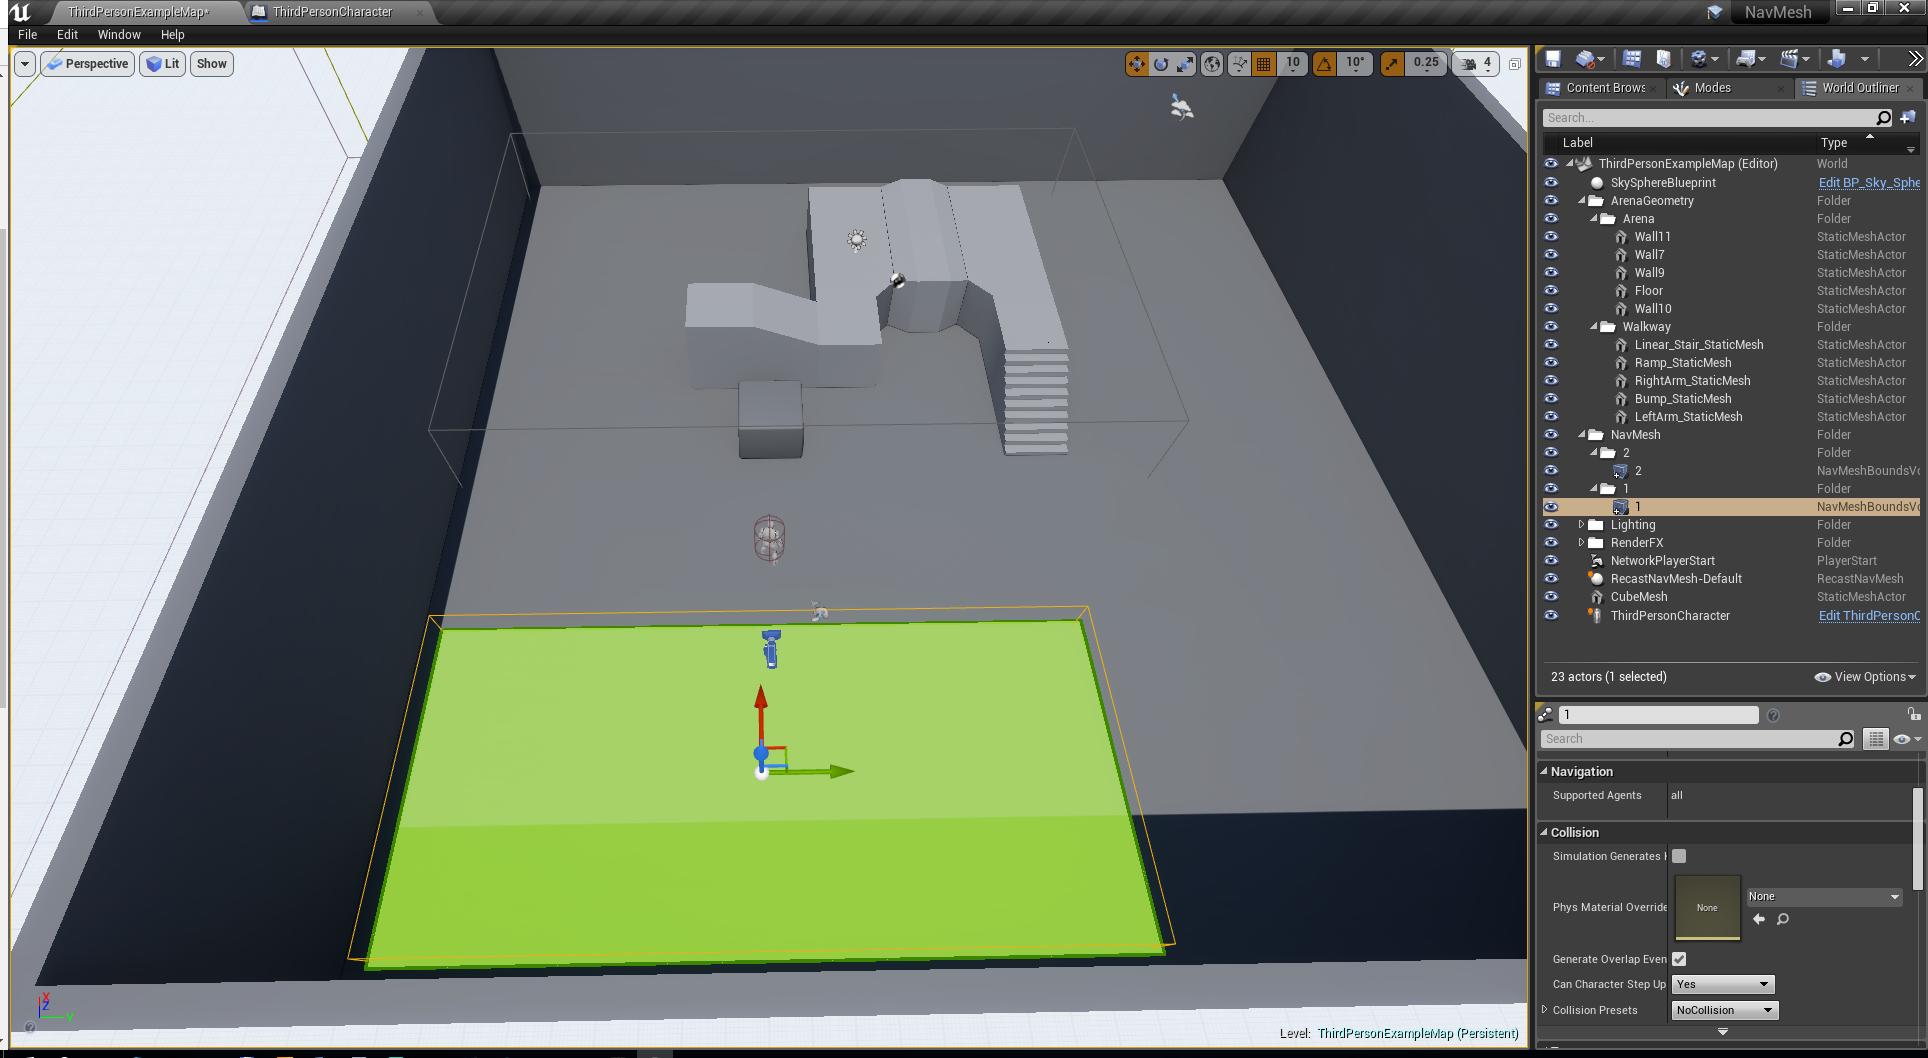 Unreal Engine 4 — как устроенна навигация в NavMeshBoundsVolume - 3